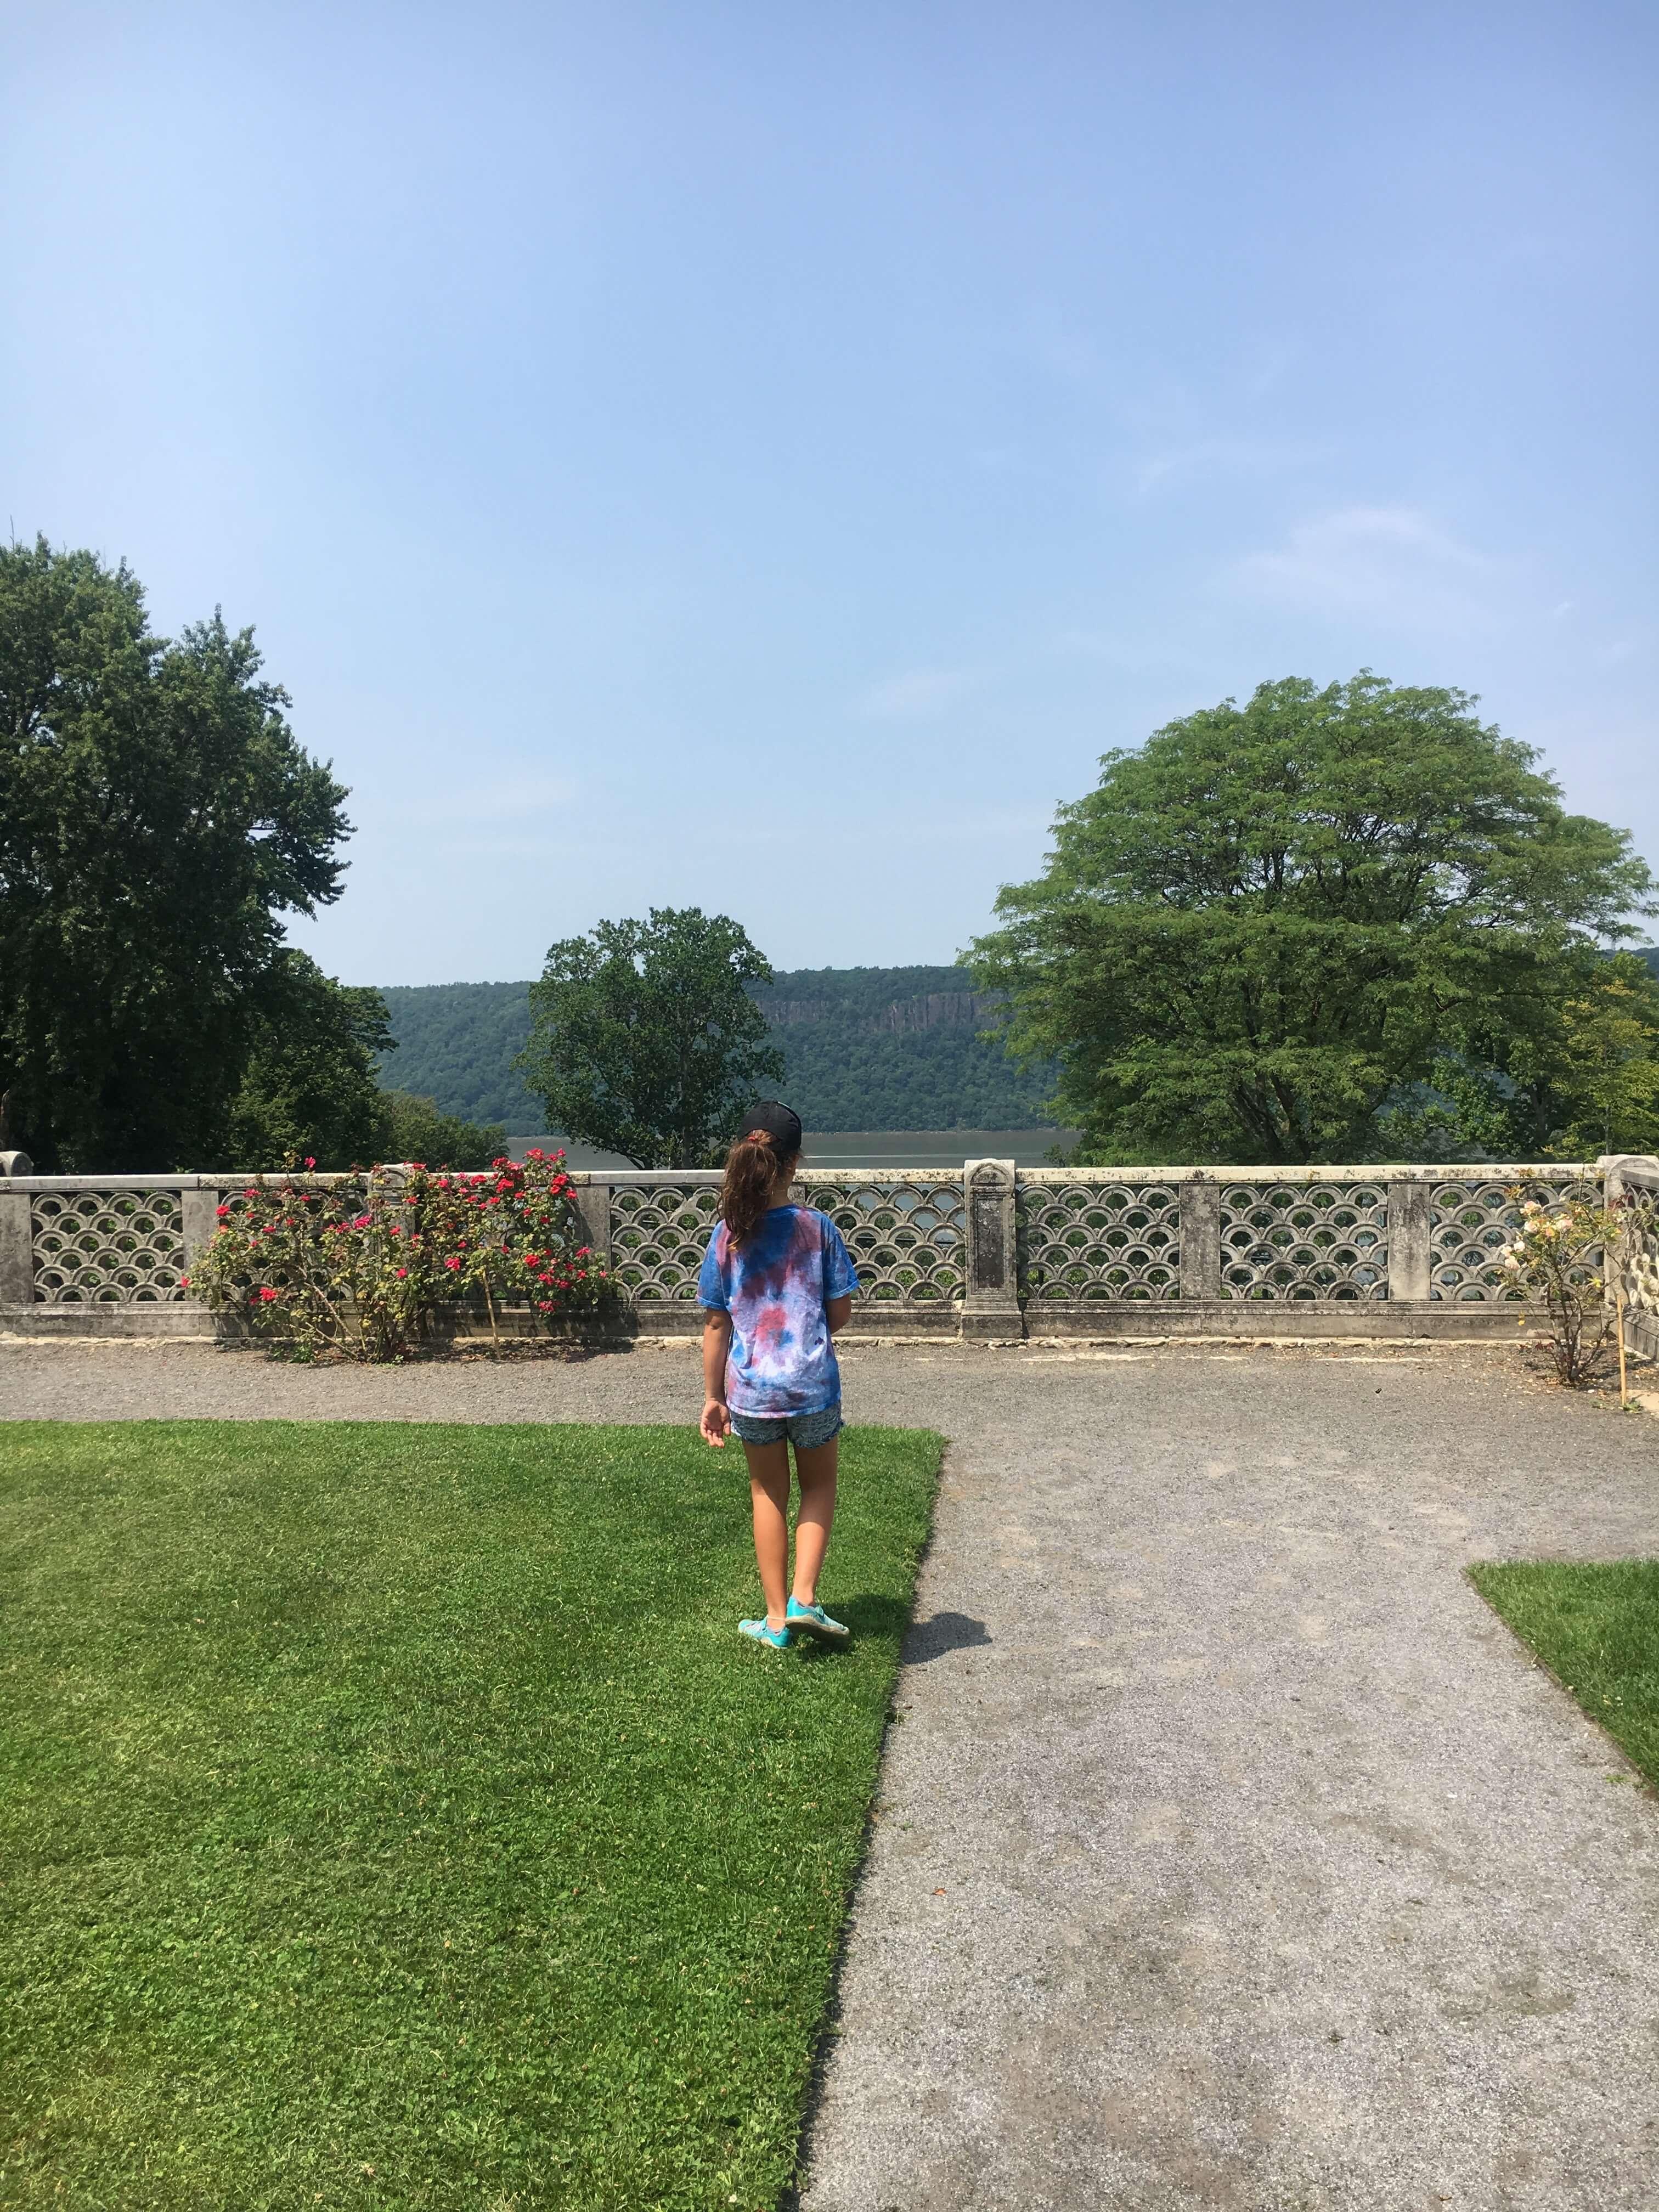 Day Trip to the Untermyer Gardens Conservatory kids